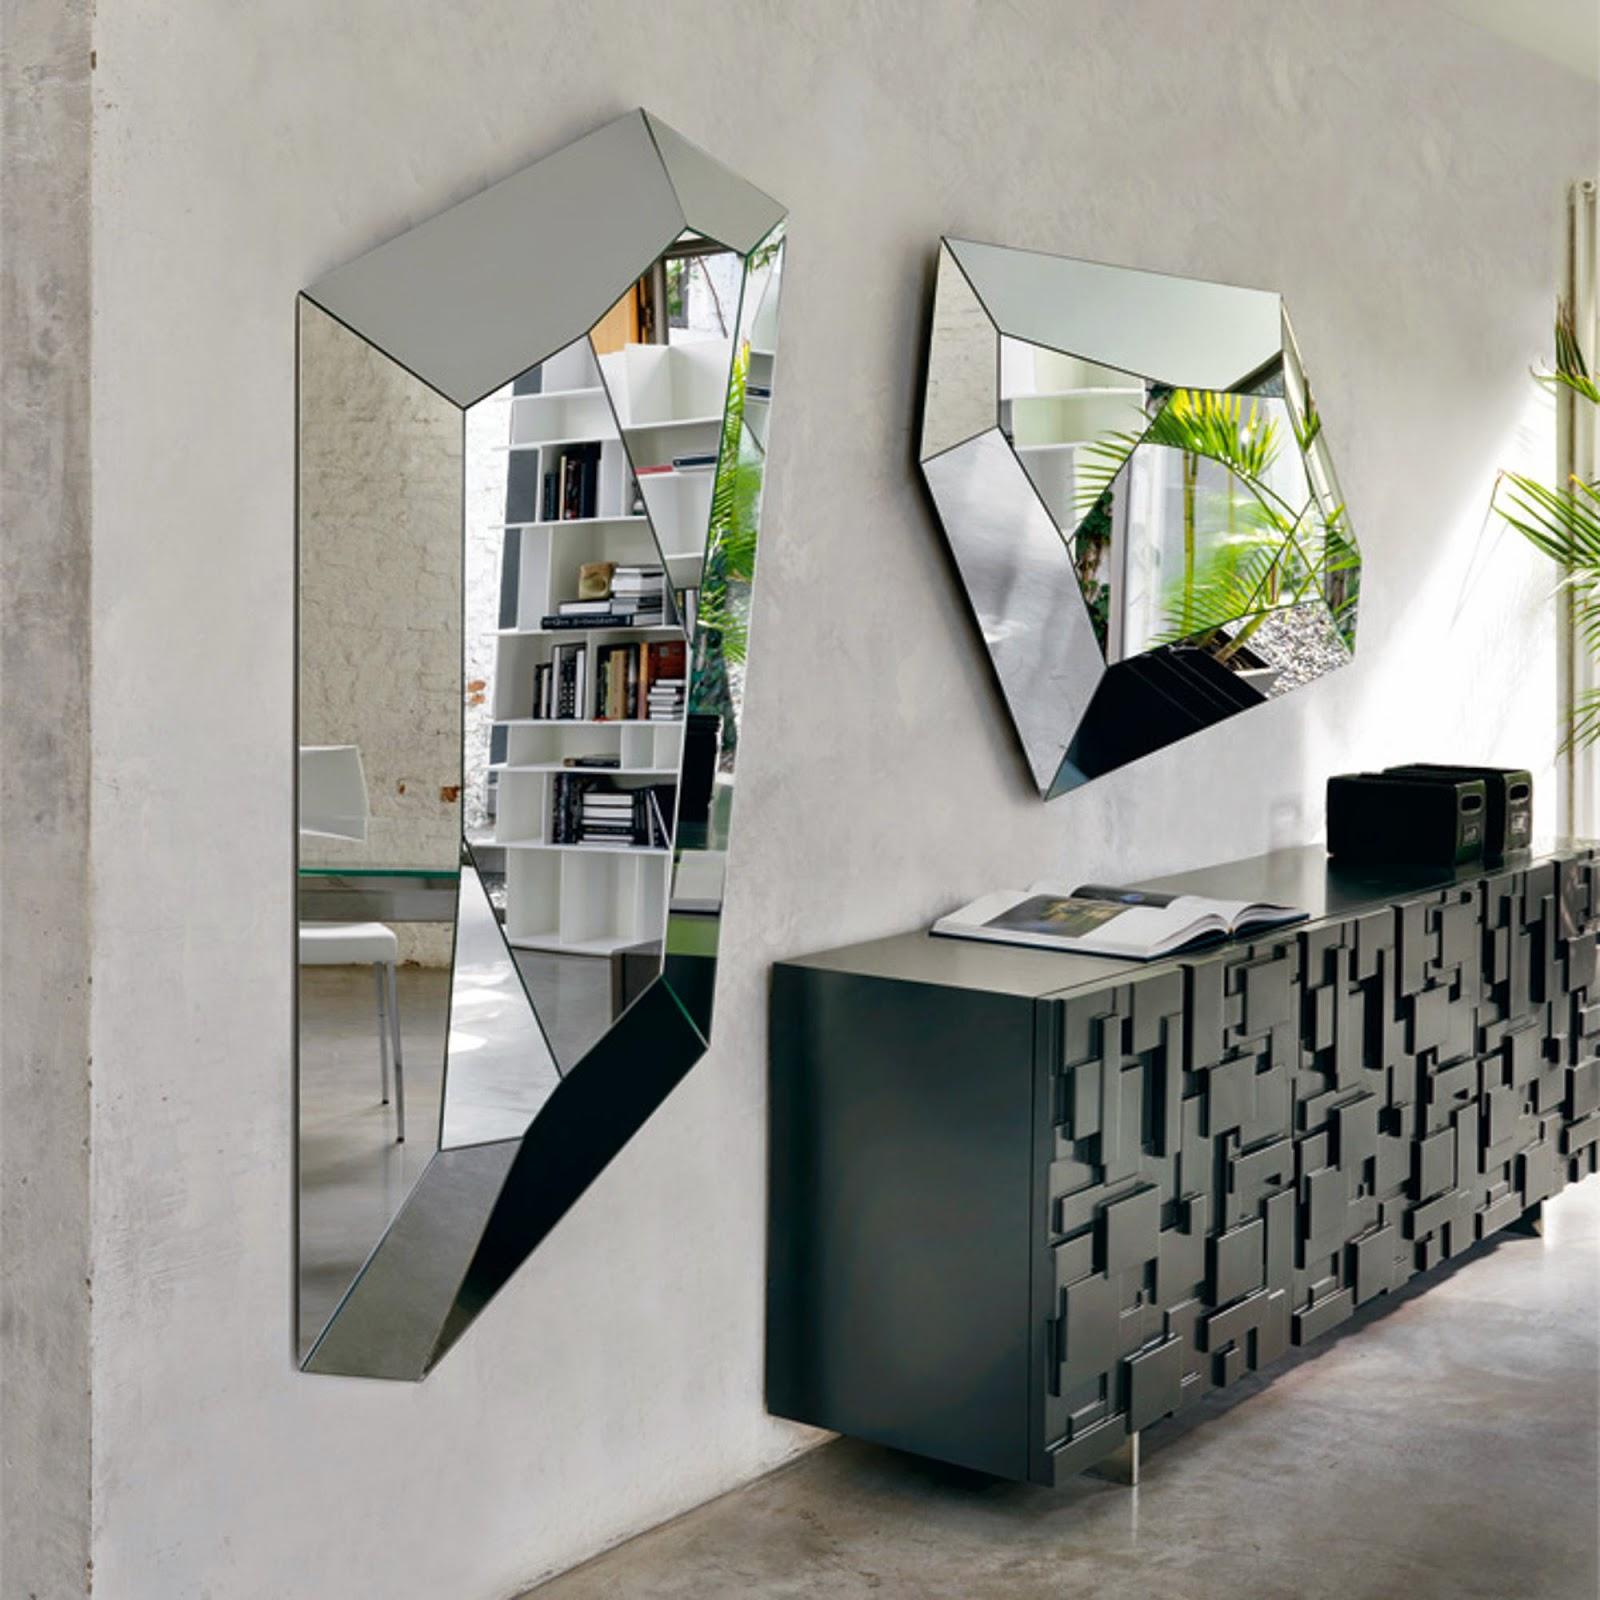 Sideboard Labyrinth Cattelan Italia Italian Furniture